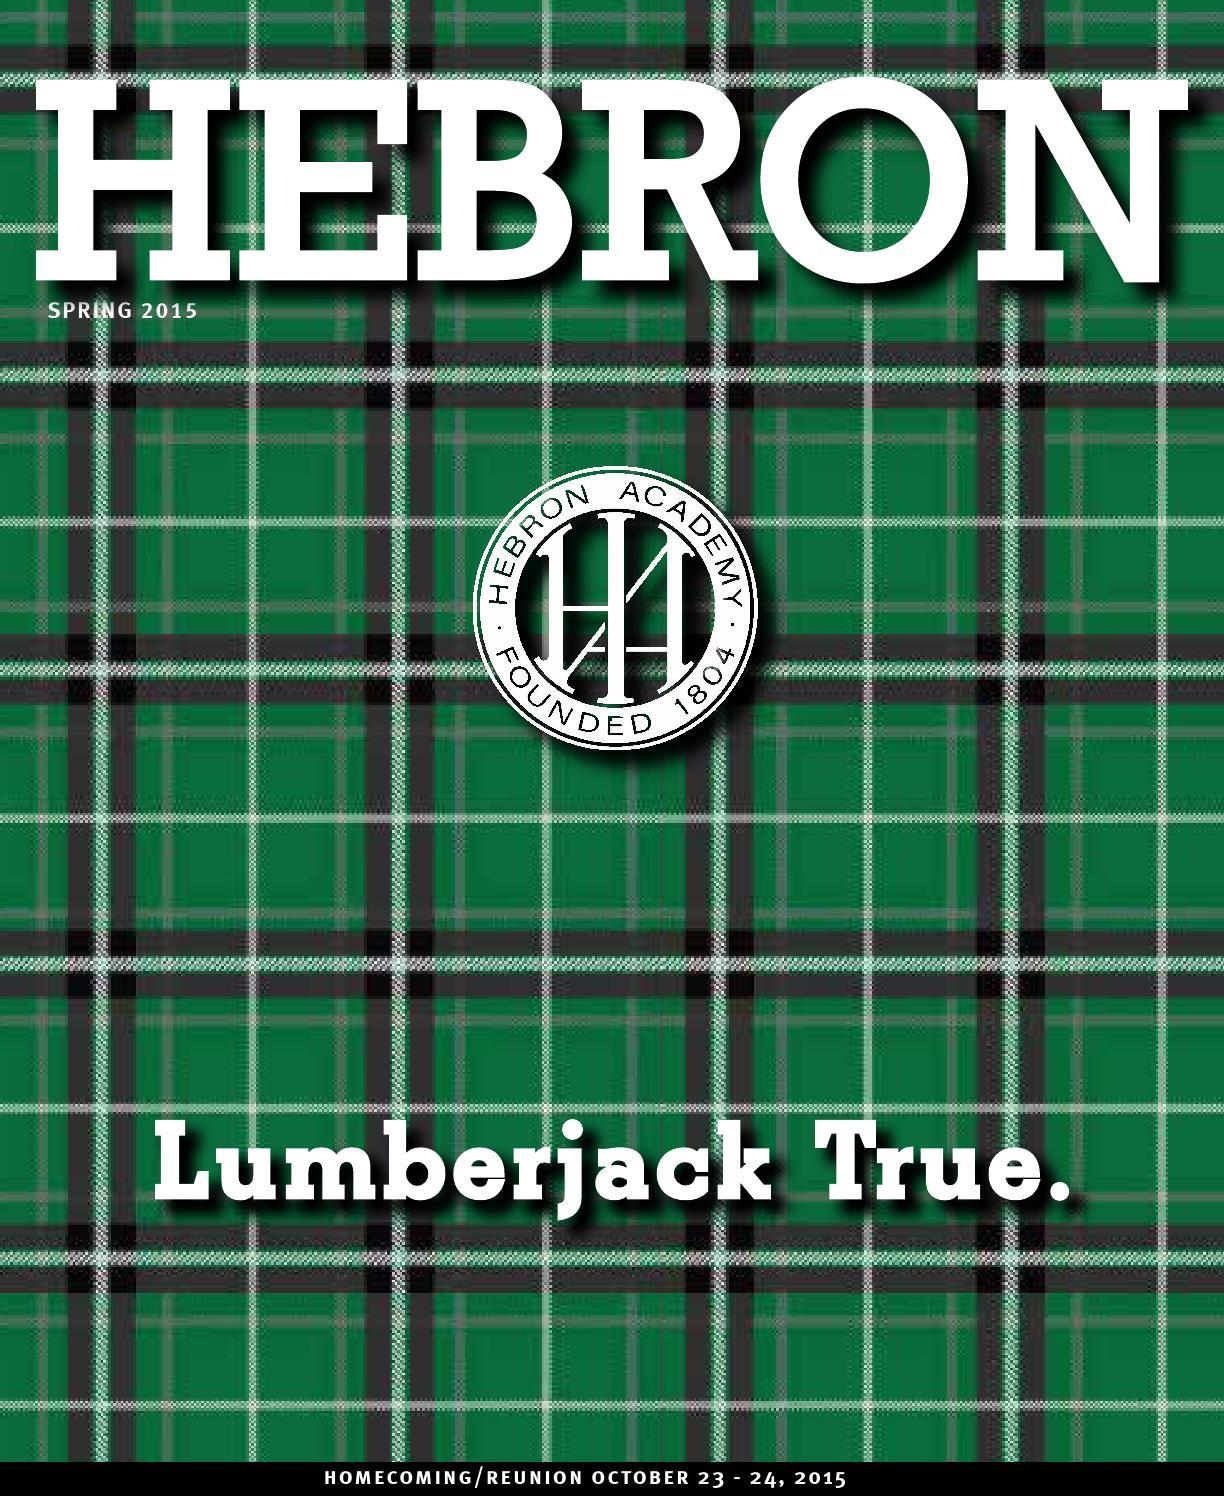 HEBRON Magazine Spring 2015 by Hebron Academy - issuu